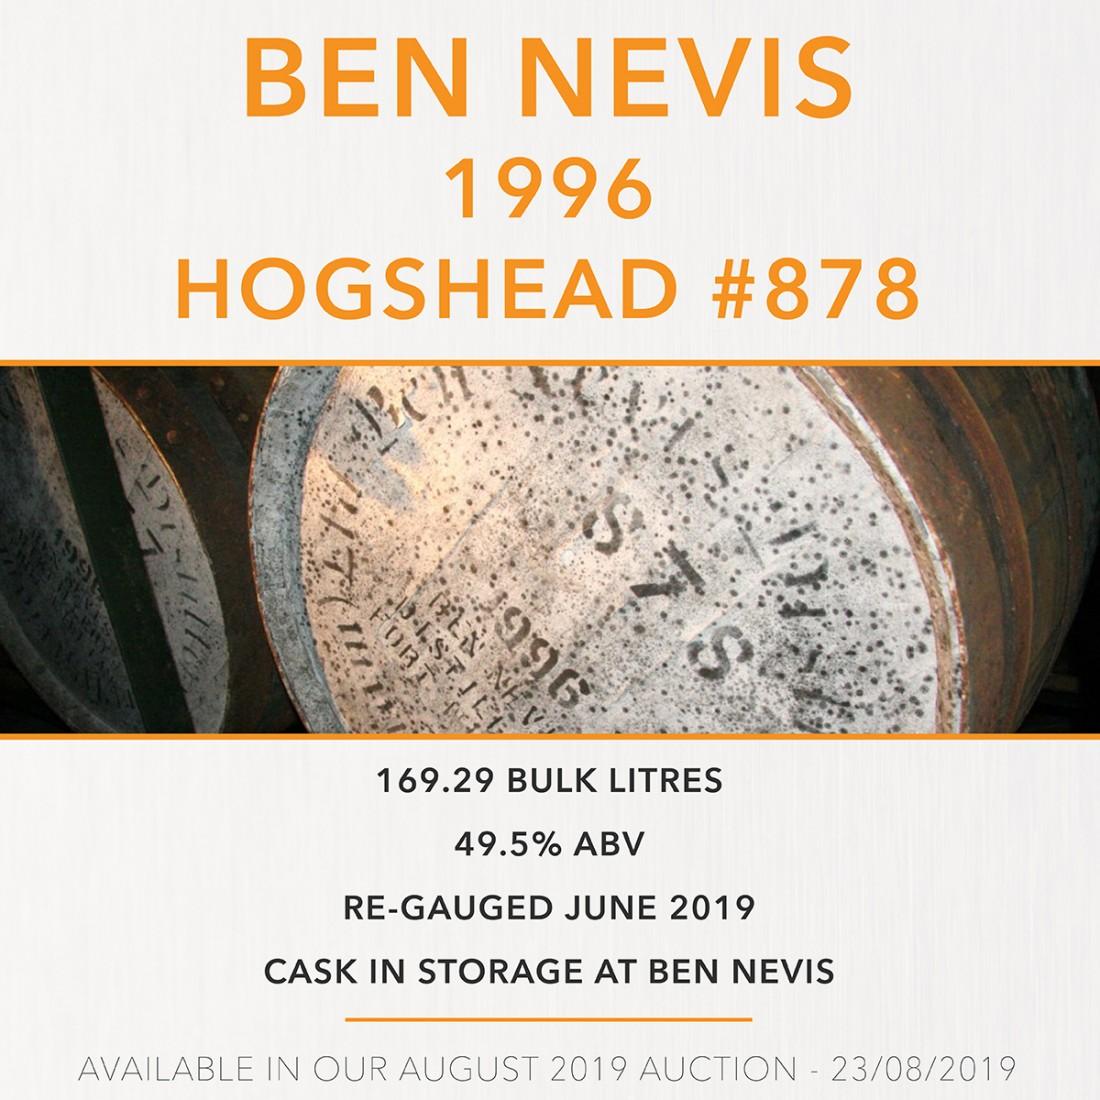 1 Ben Nevis 1996 Hogshead #878 / Cask in storage at Ben Nevis Distillery - sample TBC